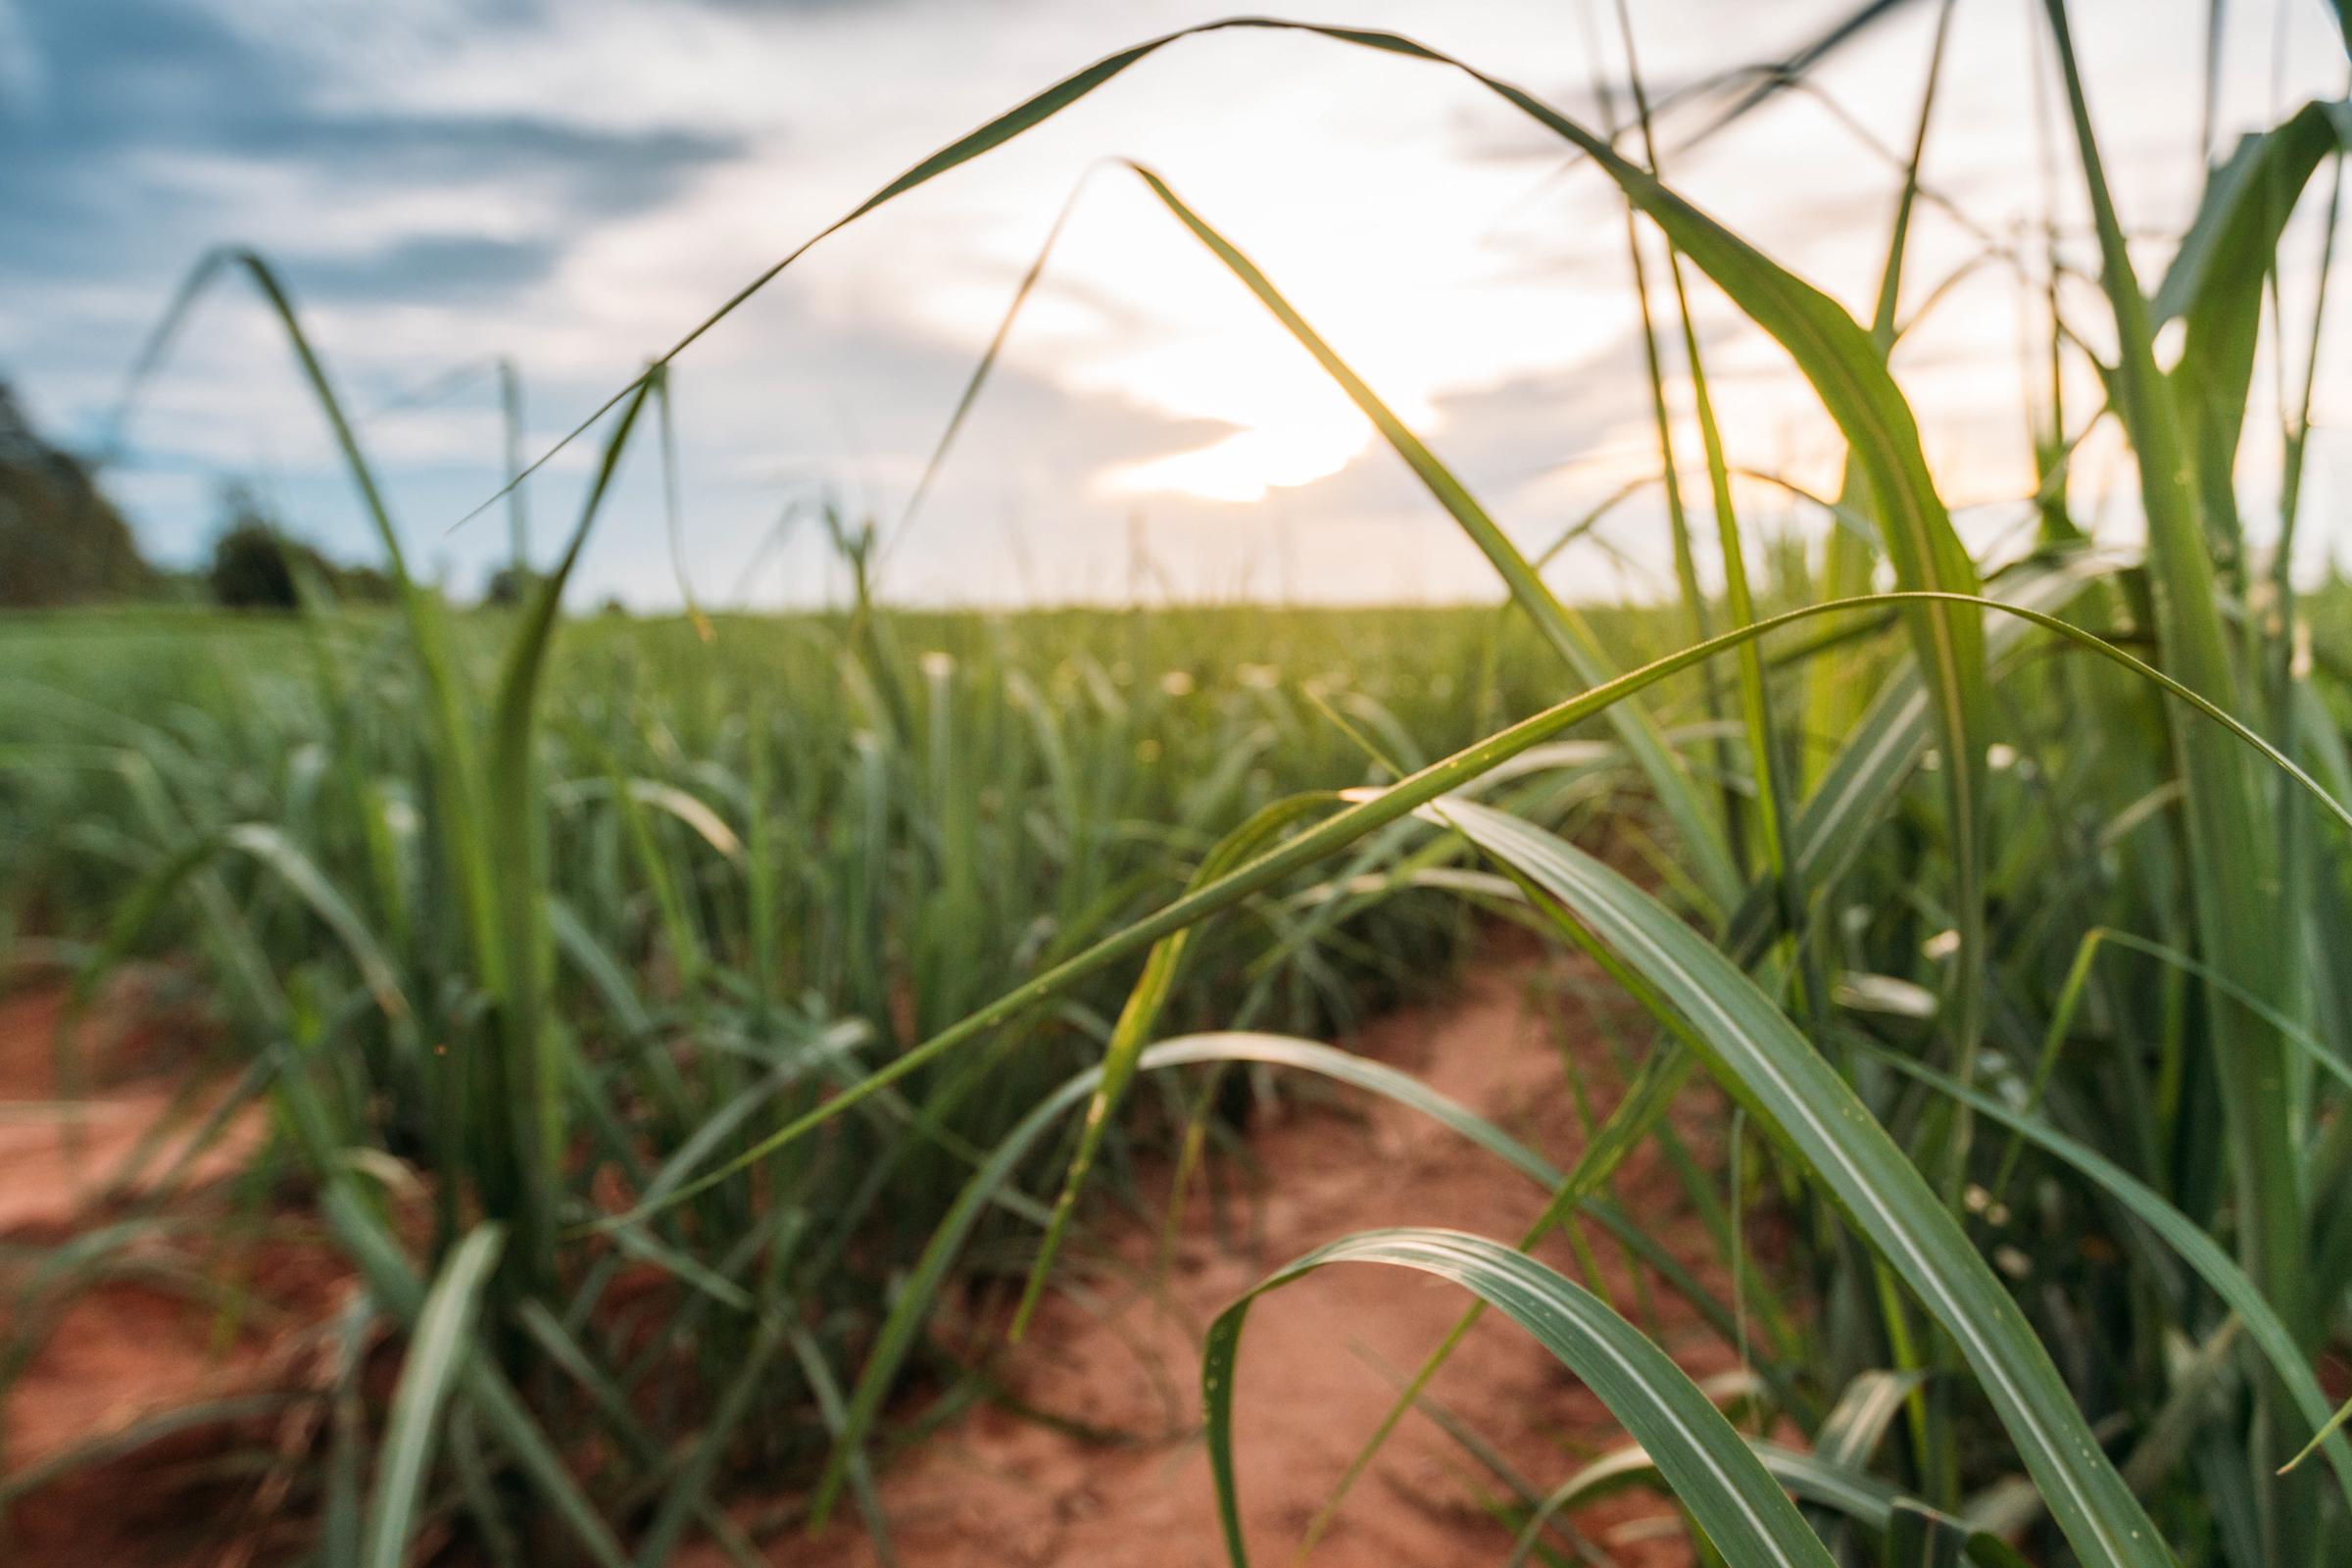 Sugarcane harvest for the second half of June 2021